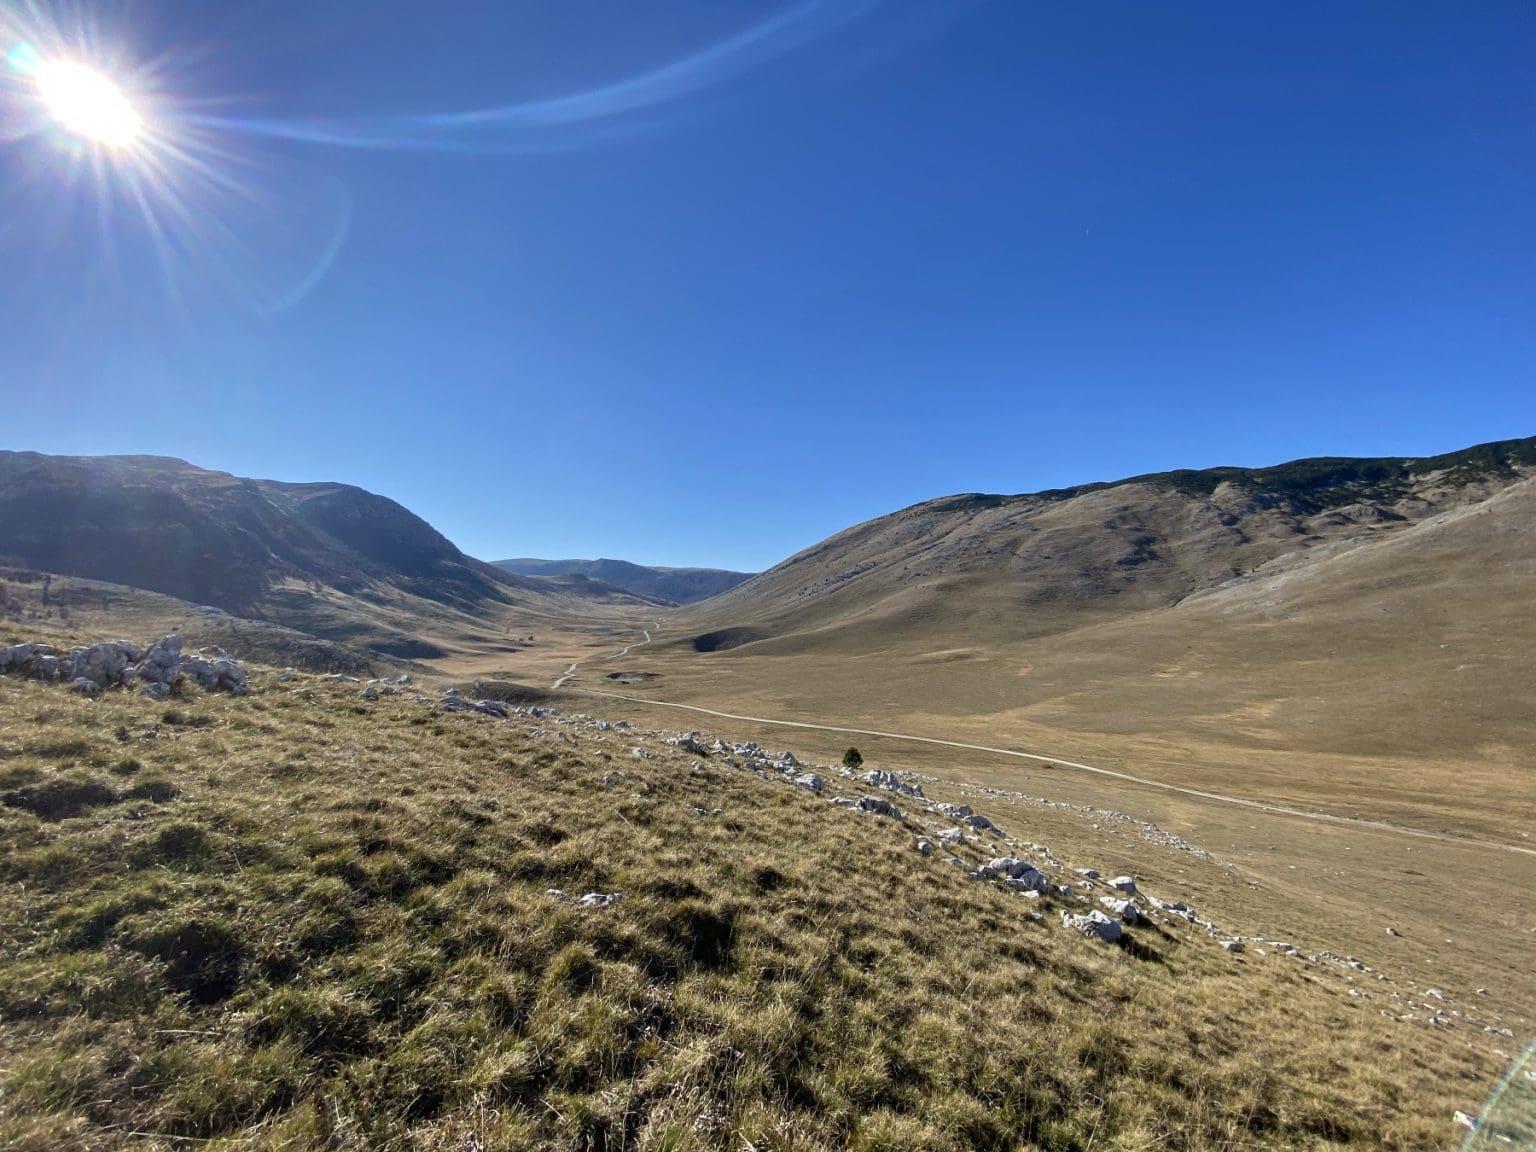 So close to heaven - In The Mountain Village Lukomir 6